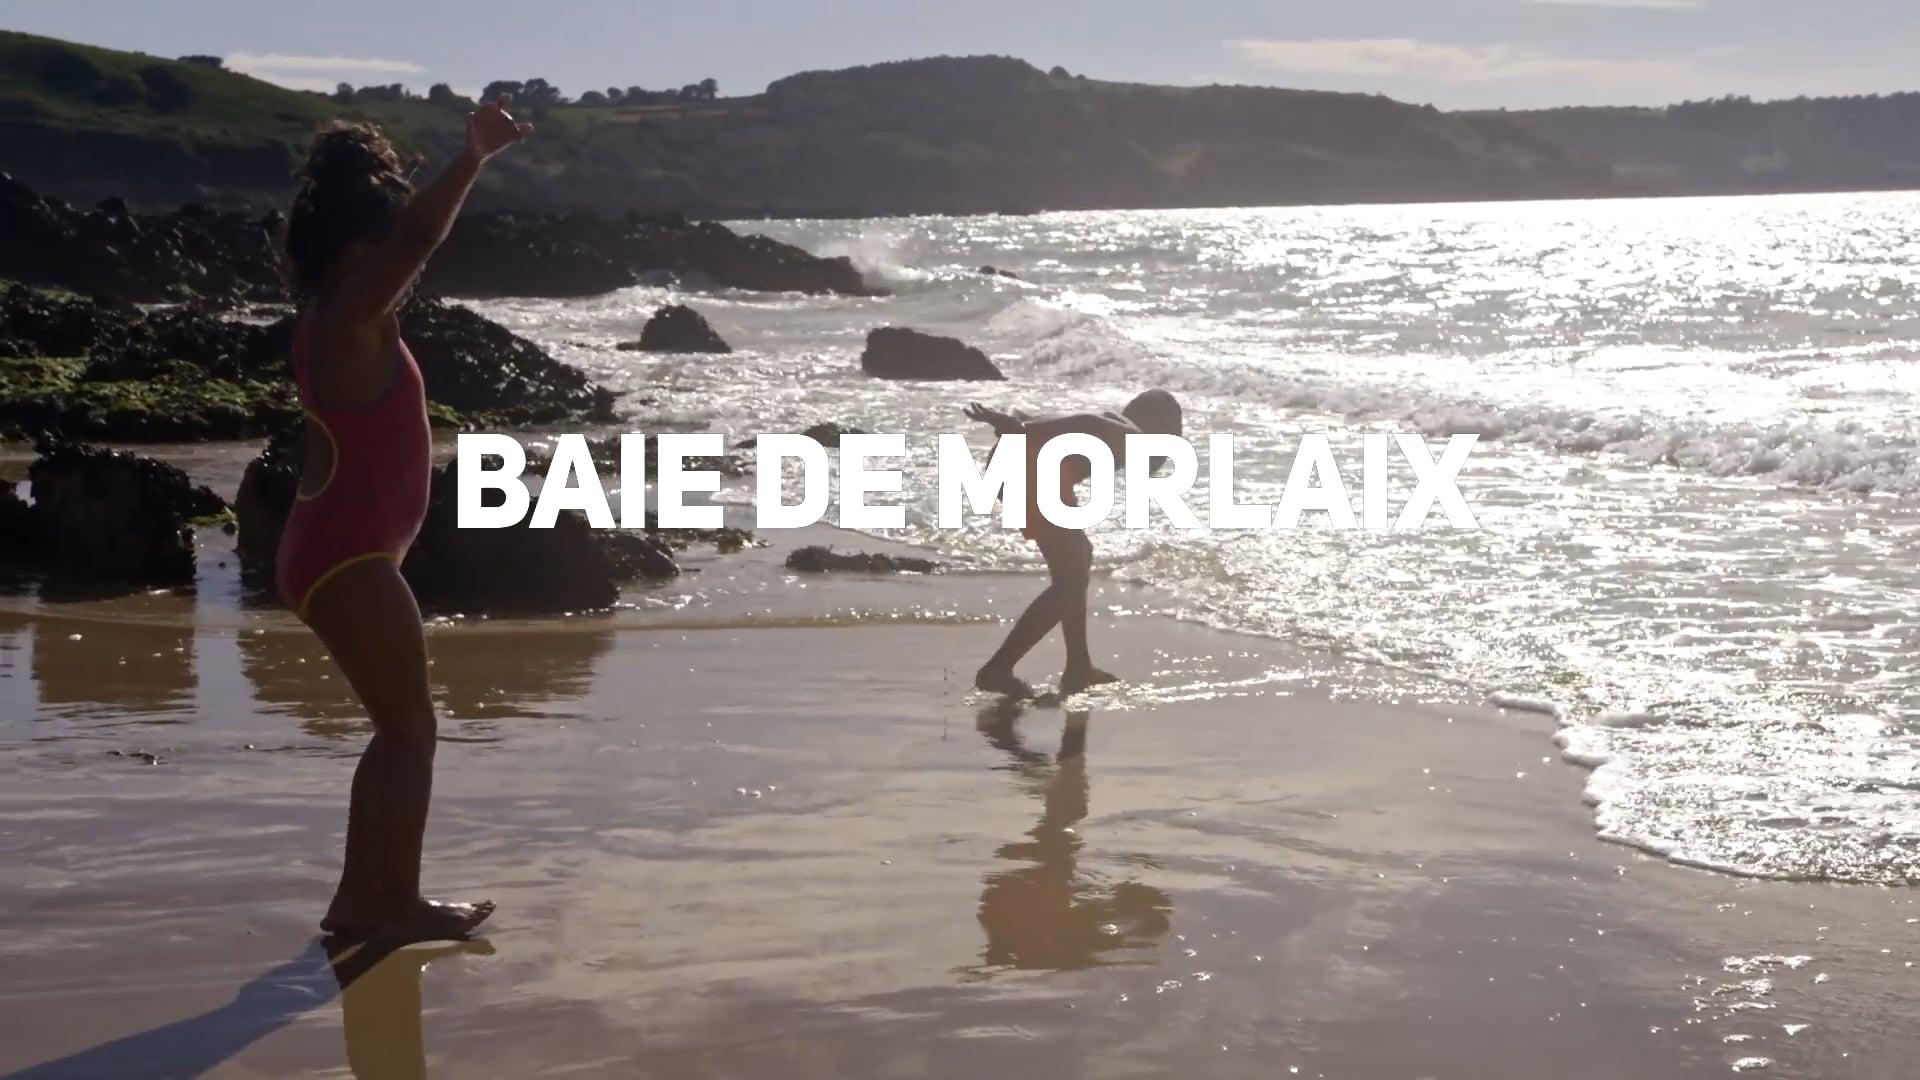 Baie de morlaix 2020